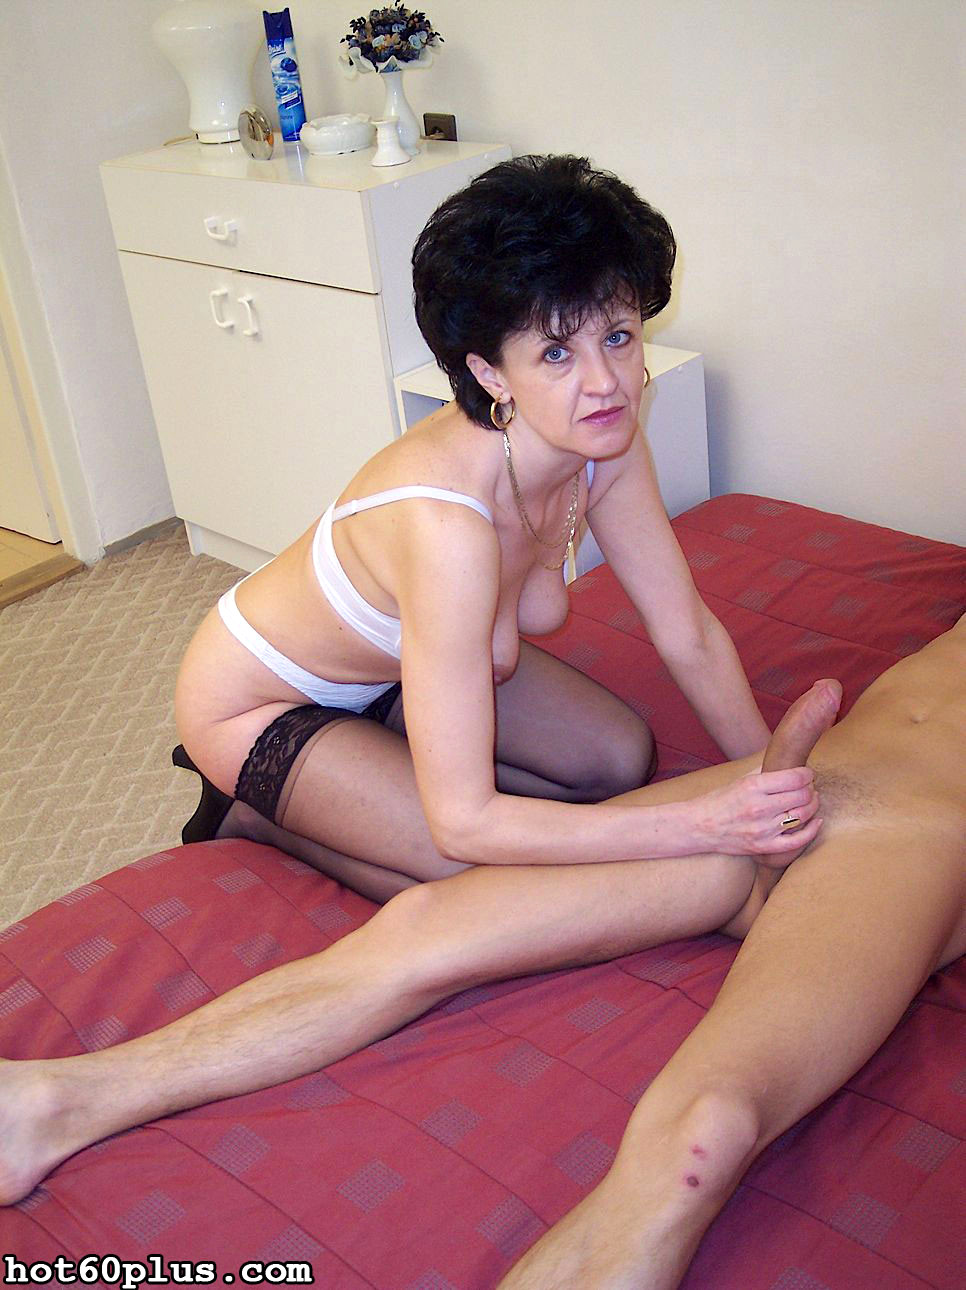 senior dating 60 plus free webcams